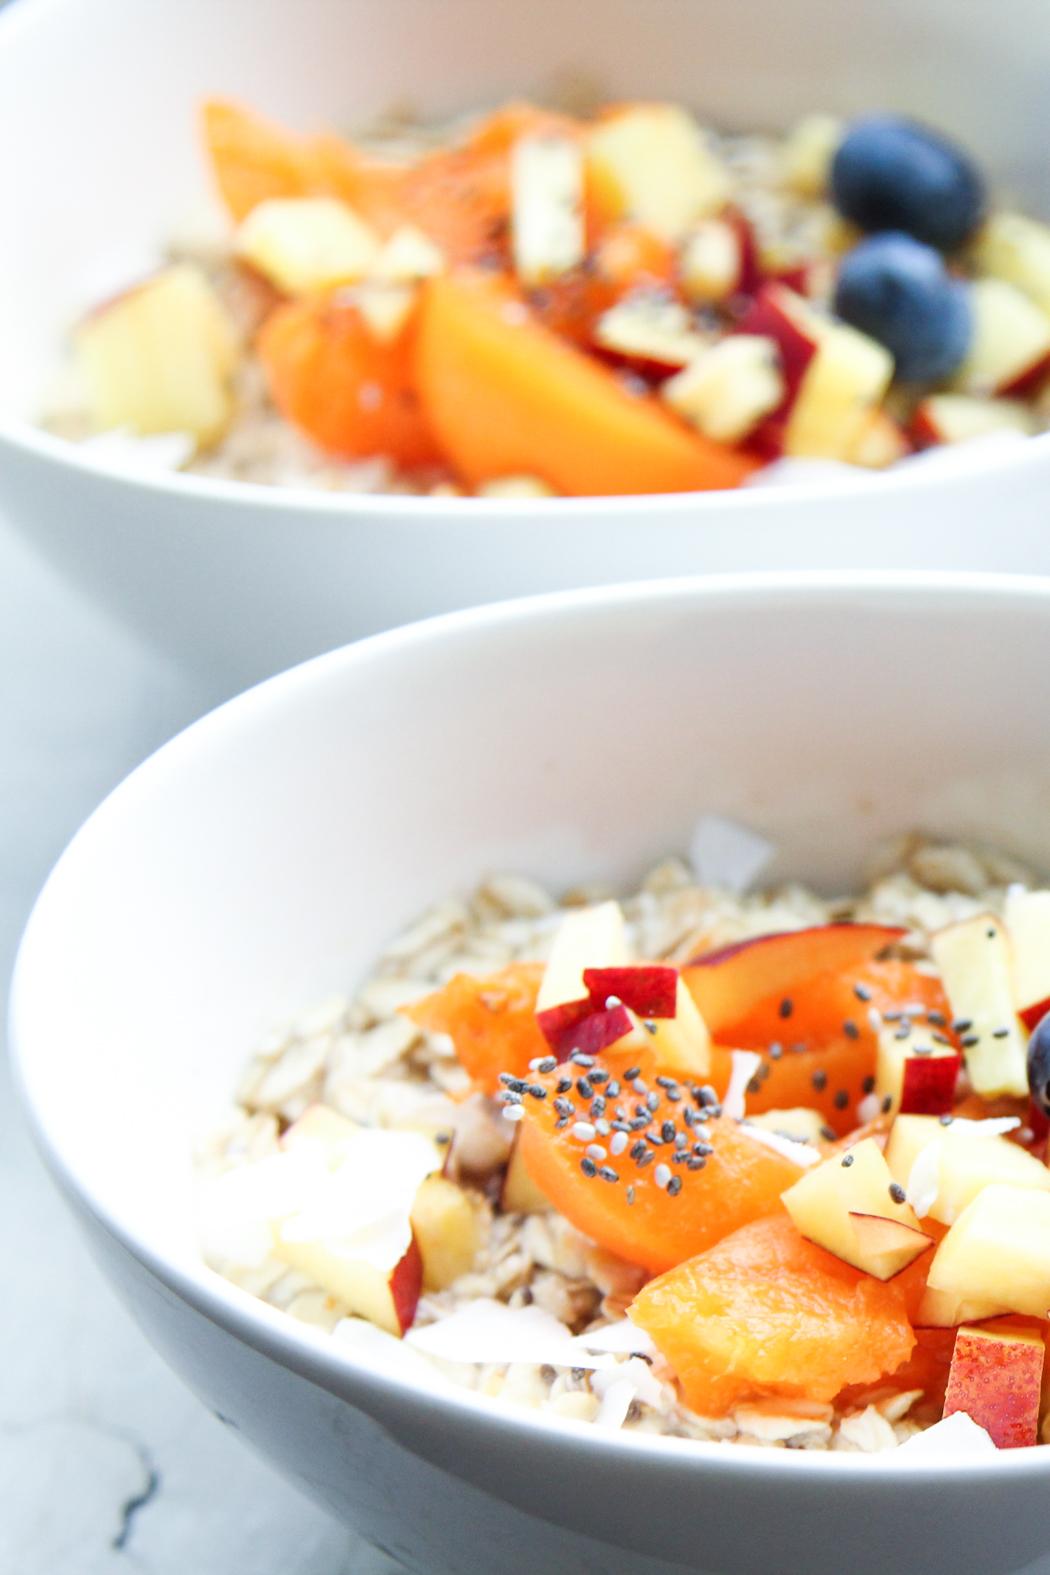 Lindarella-Foodblogger-Oatmeal-München-Vegan-Frühstück-2